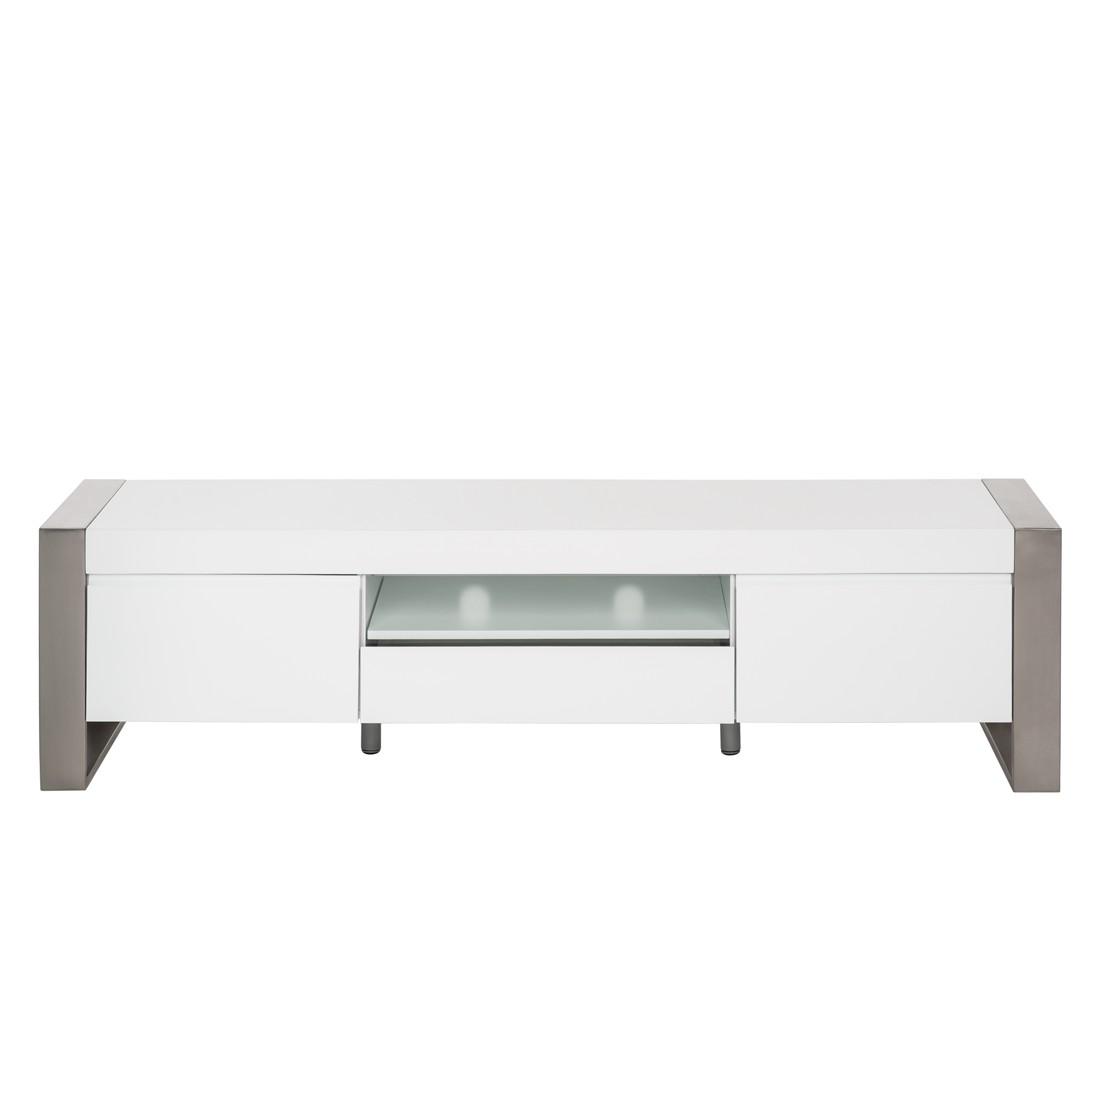 TV-Lowboard Oslo – Hochglanz Weiß, loftscape jetzt bestellen